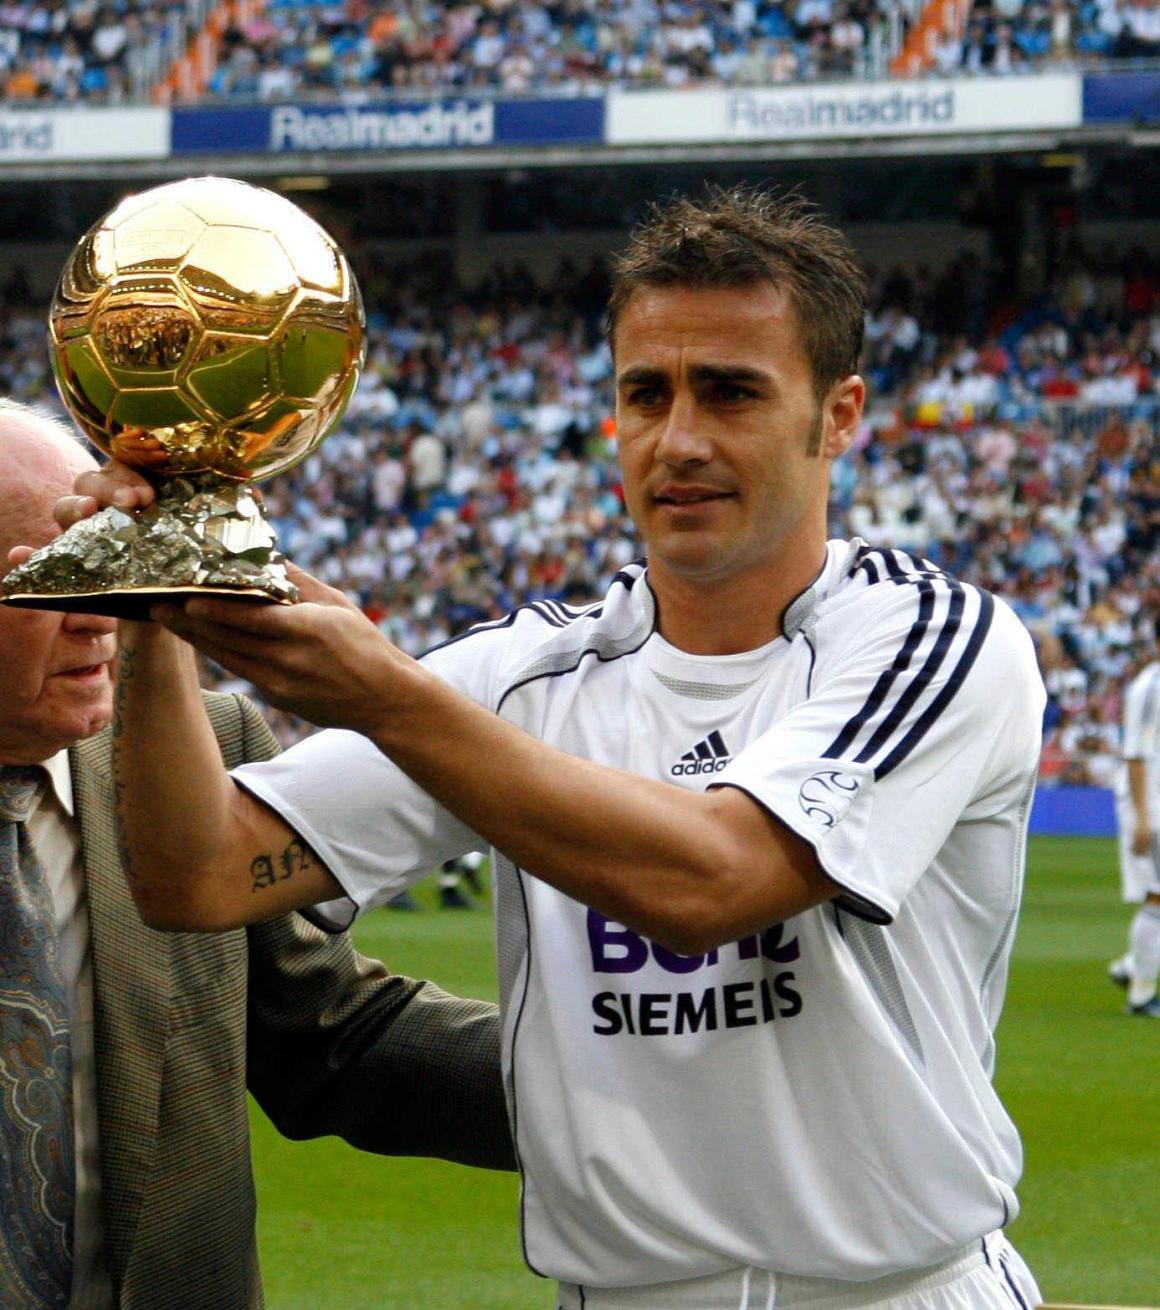 Although his stay here was short, he did help us win 2 La Liga's. Happy Birthday to Italian Legend, Fabio Cannavaro.: realmadrid